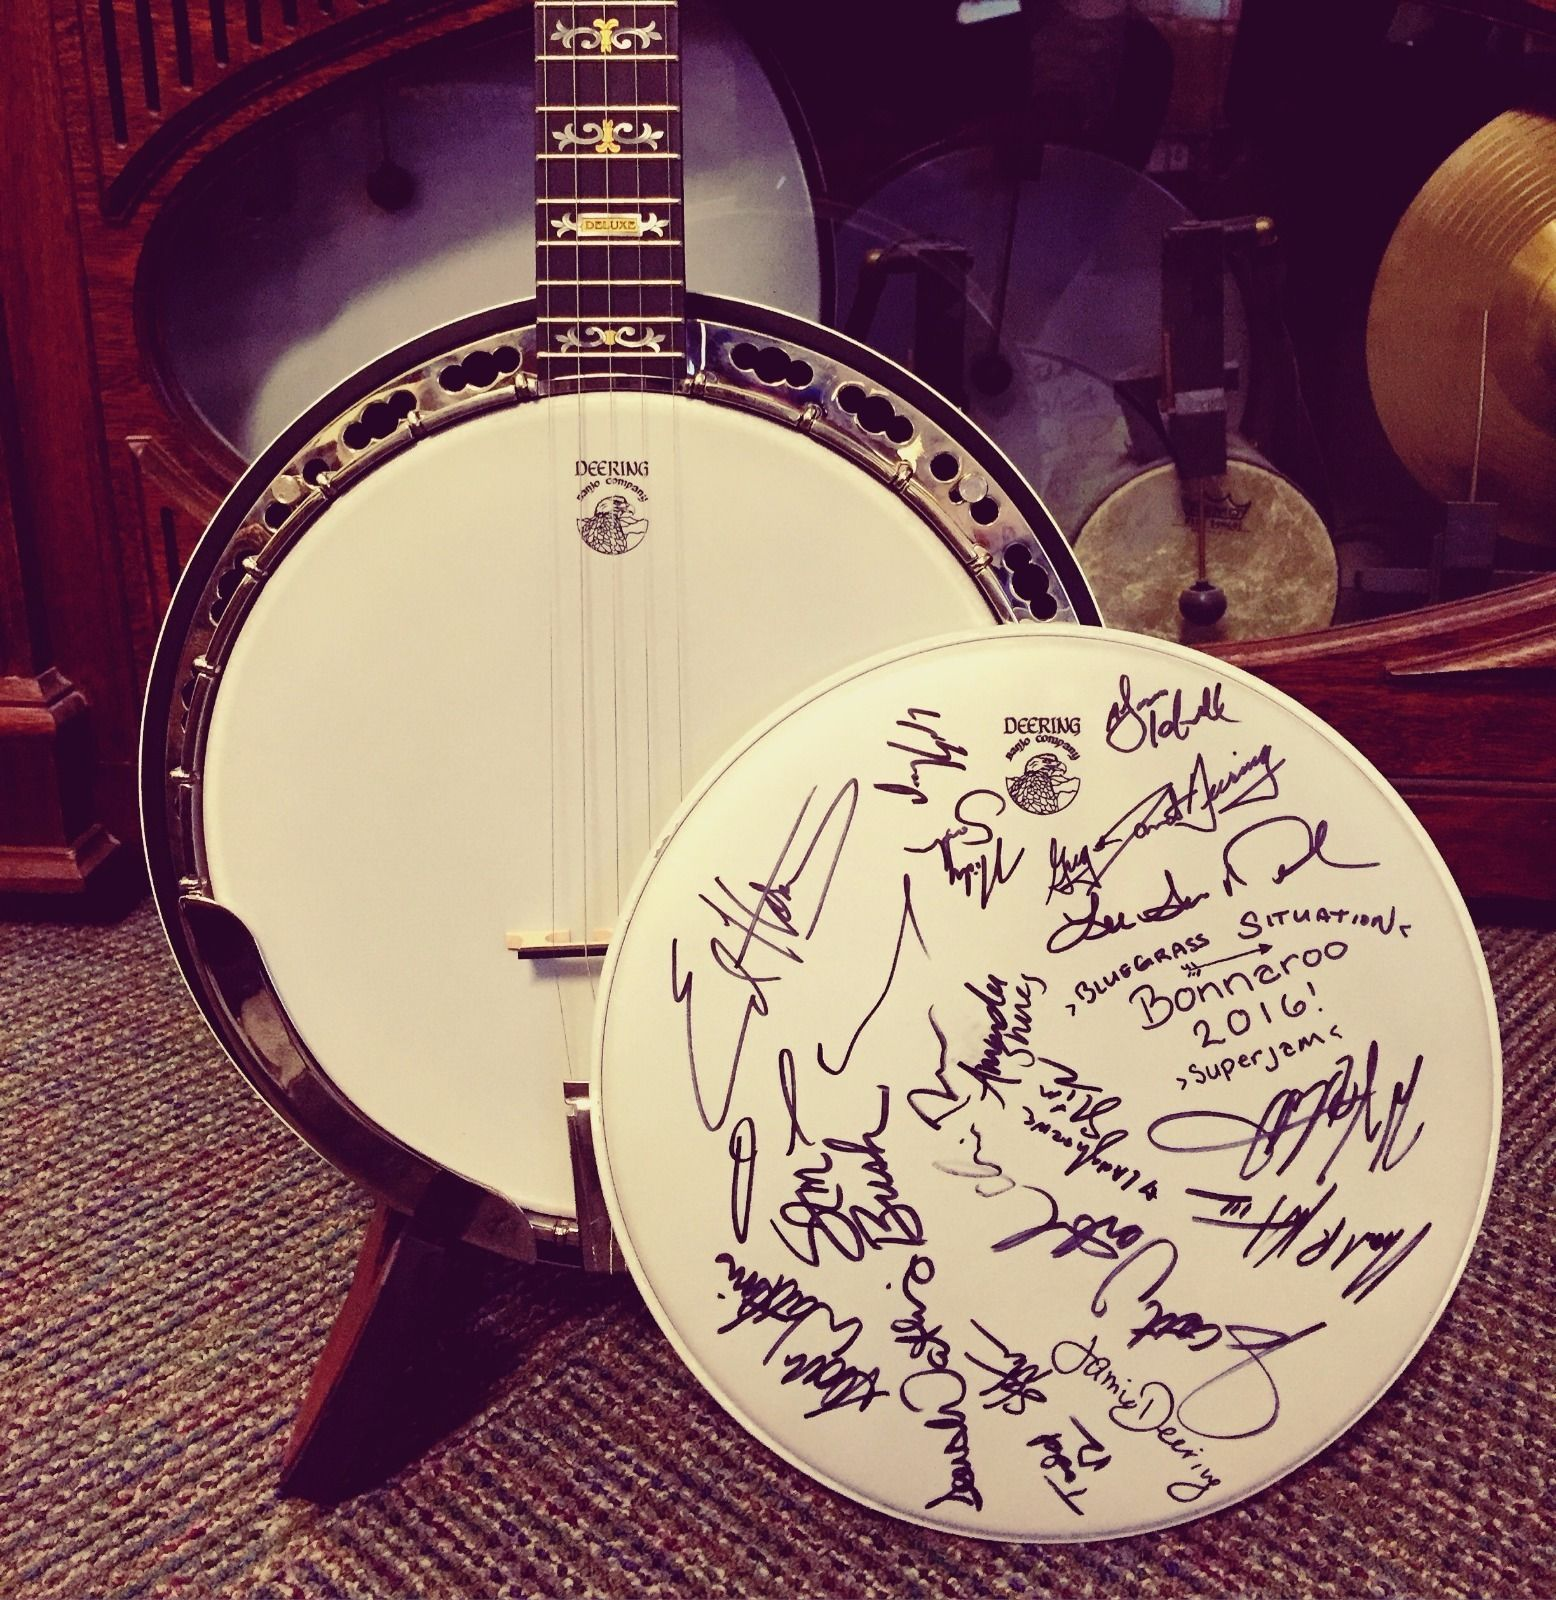 Bid on a Banjo to Help Pharis and Jason Romero